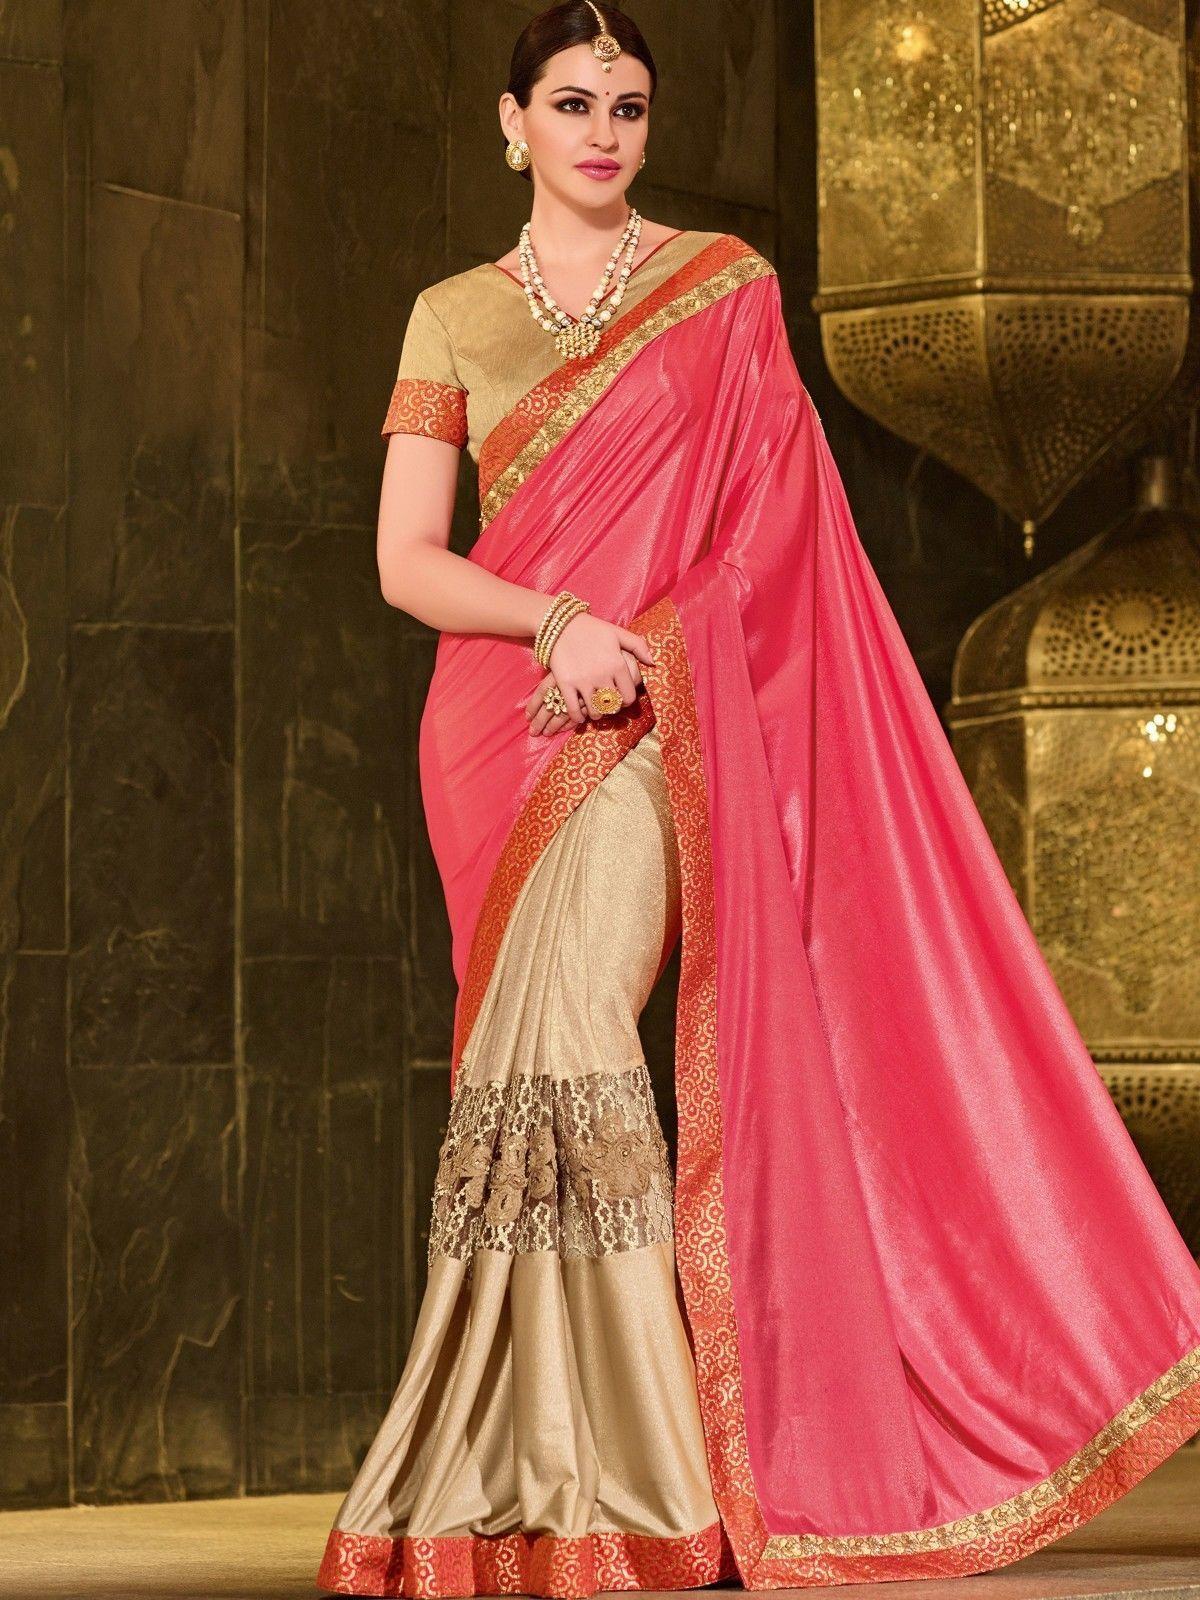 Saree for women wedding indian women wedding wear saree bridal partywear pakistani work sari